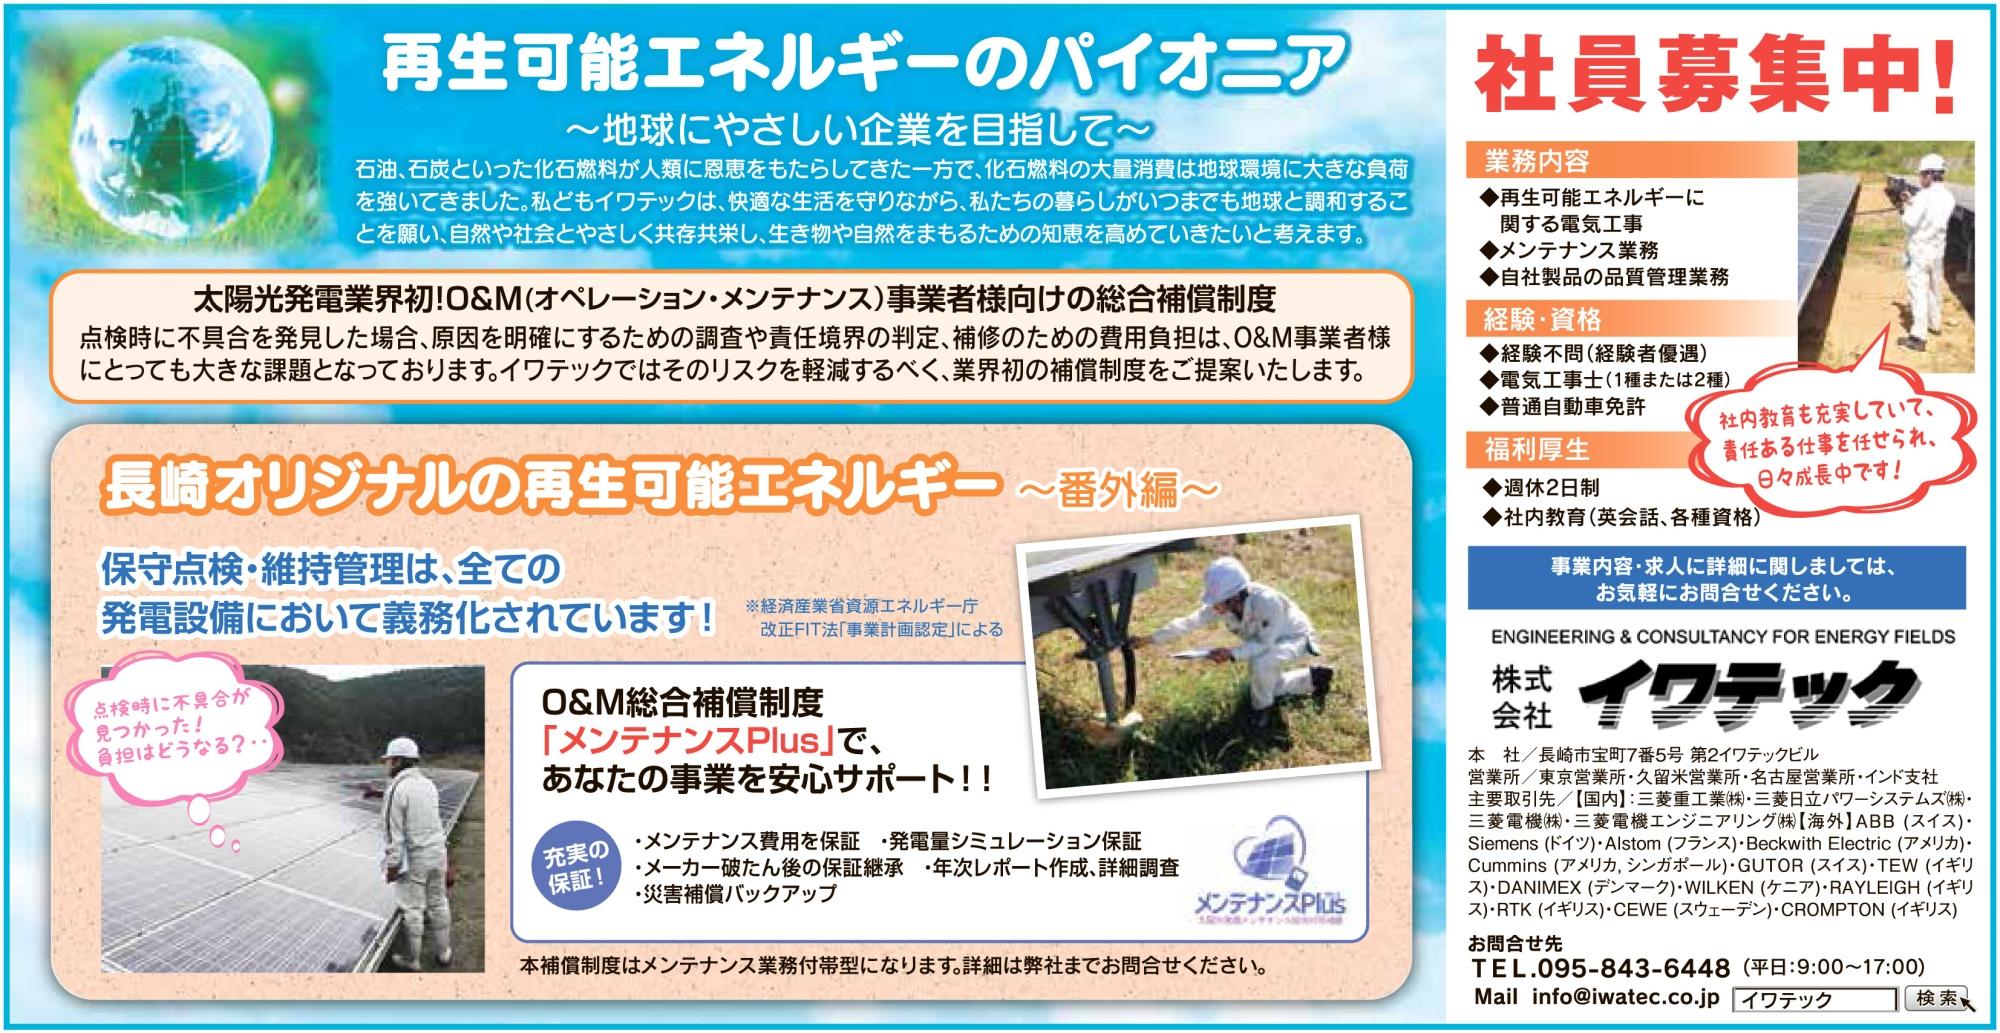 第3弾 長崎新聞のNR(Nagasaki Reader)11月号広告掲載!